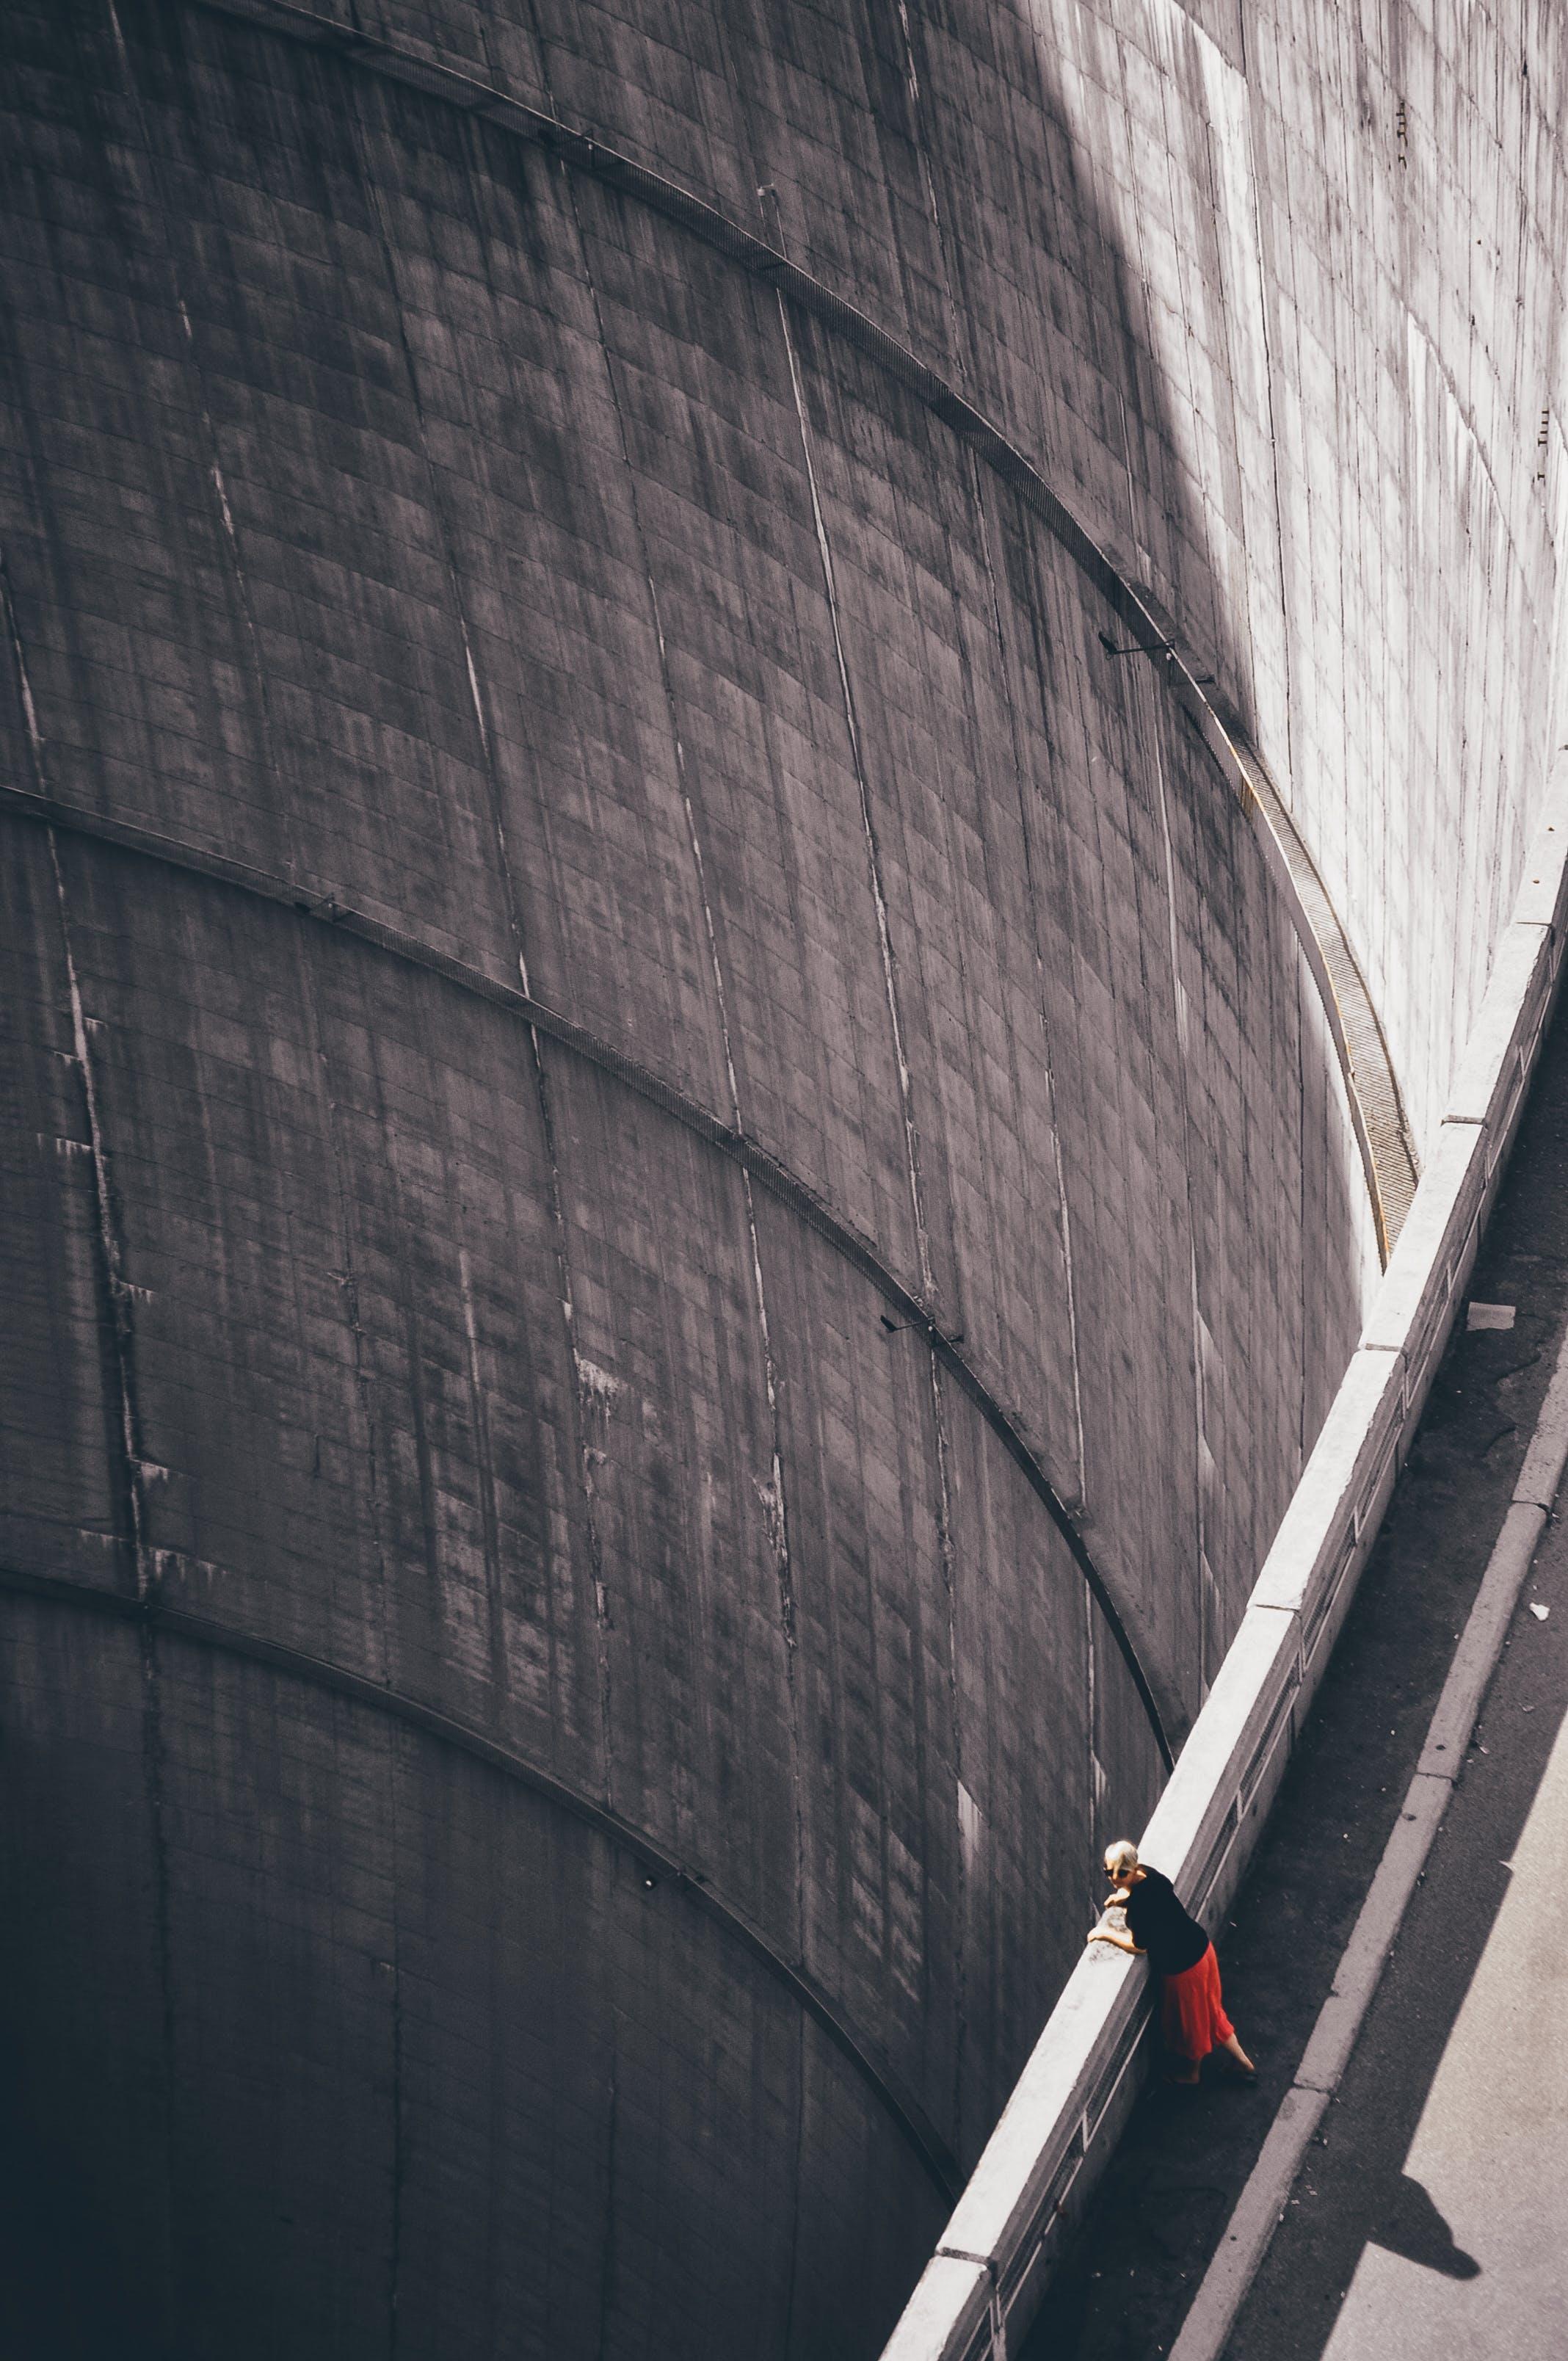 Woman Wearing Black Shirt Looking Down Through Hoover's Dam